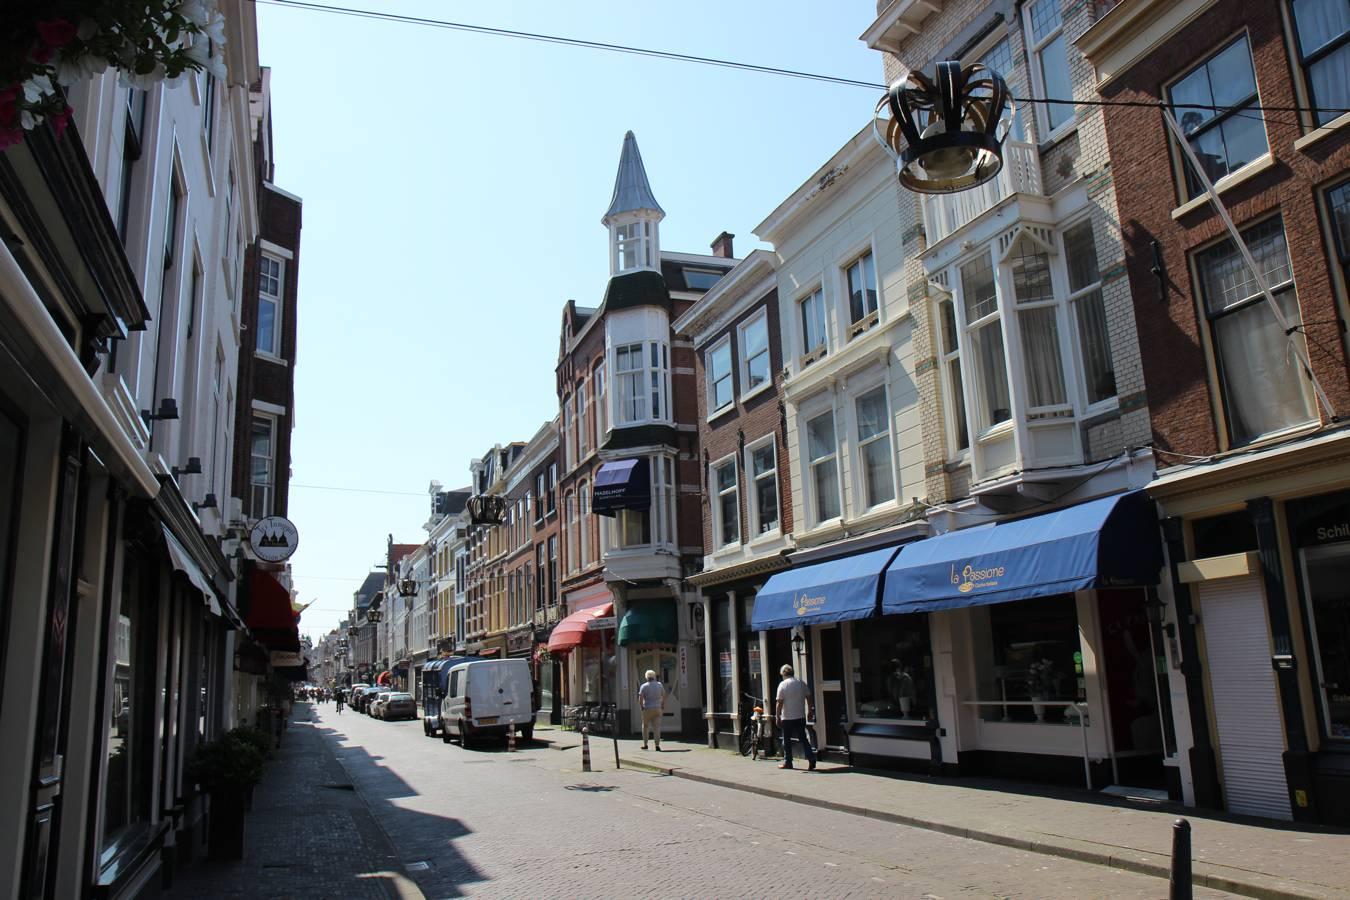 La Passione Den Haag